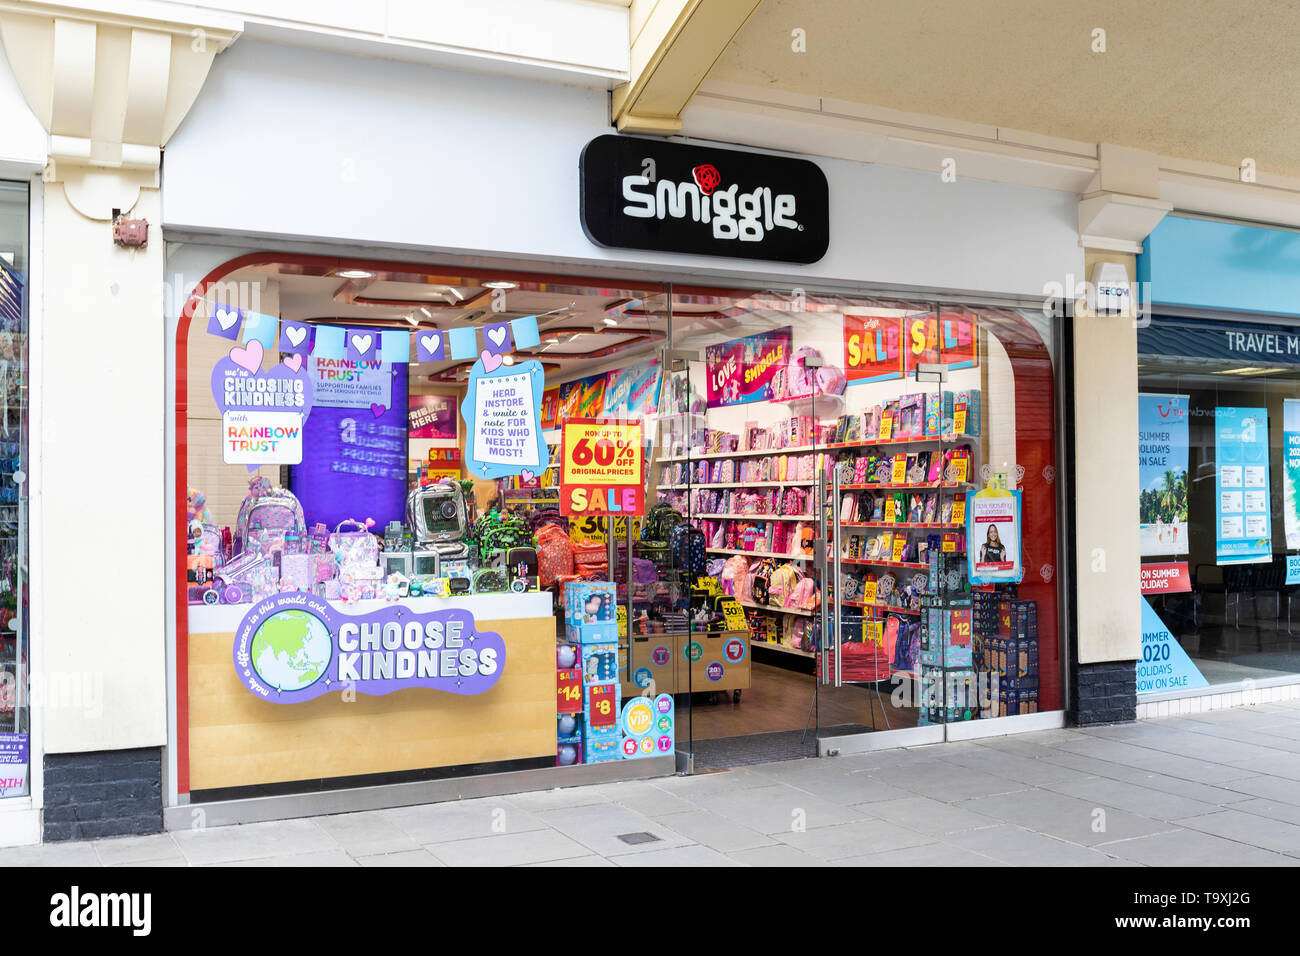 Smiggle - papeterie à Salisbury, Angleterre Photo Stock